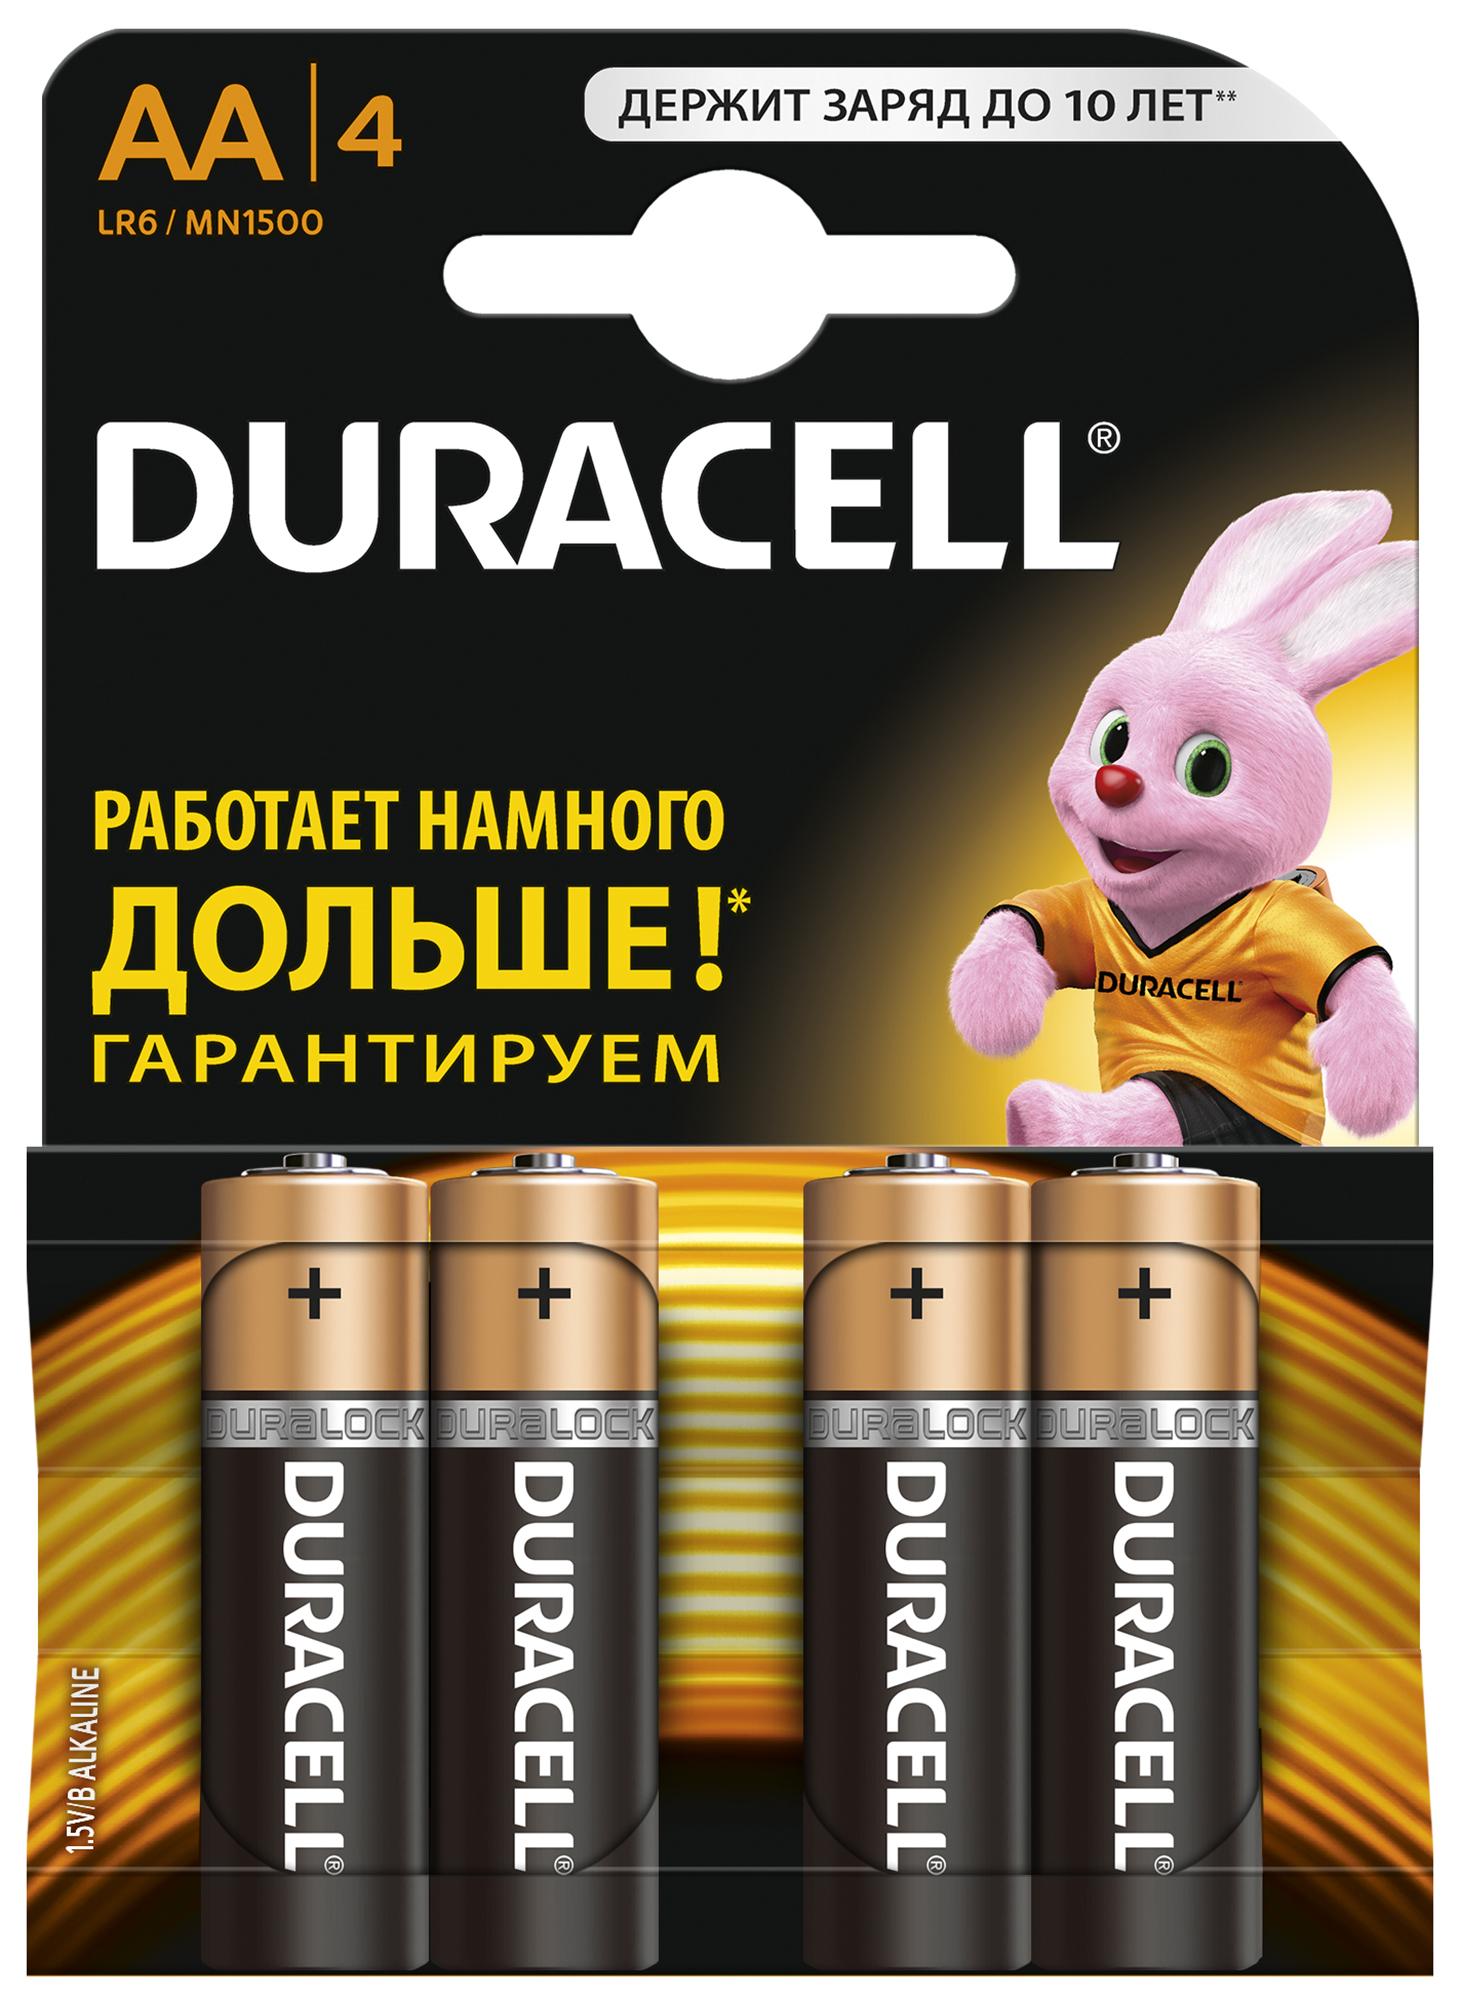 Duracell Батарейки щелочные Duracell Basic AA/LR06, 4 шт. зарядное устройство аккумуляторы duracell cef14 aa aaa 4 шт 2xaaa 850mah 2xaa 2500mah